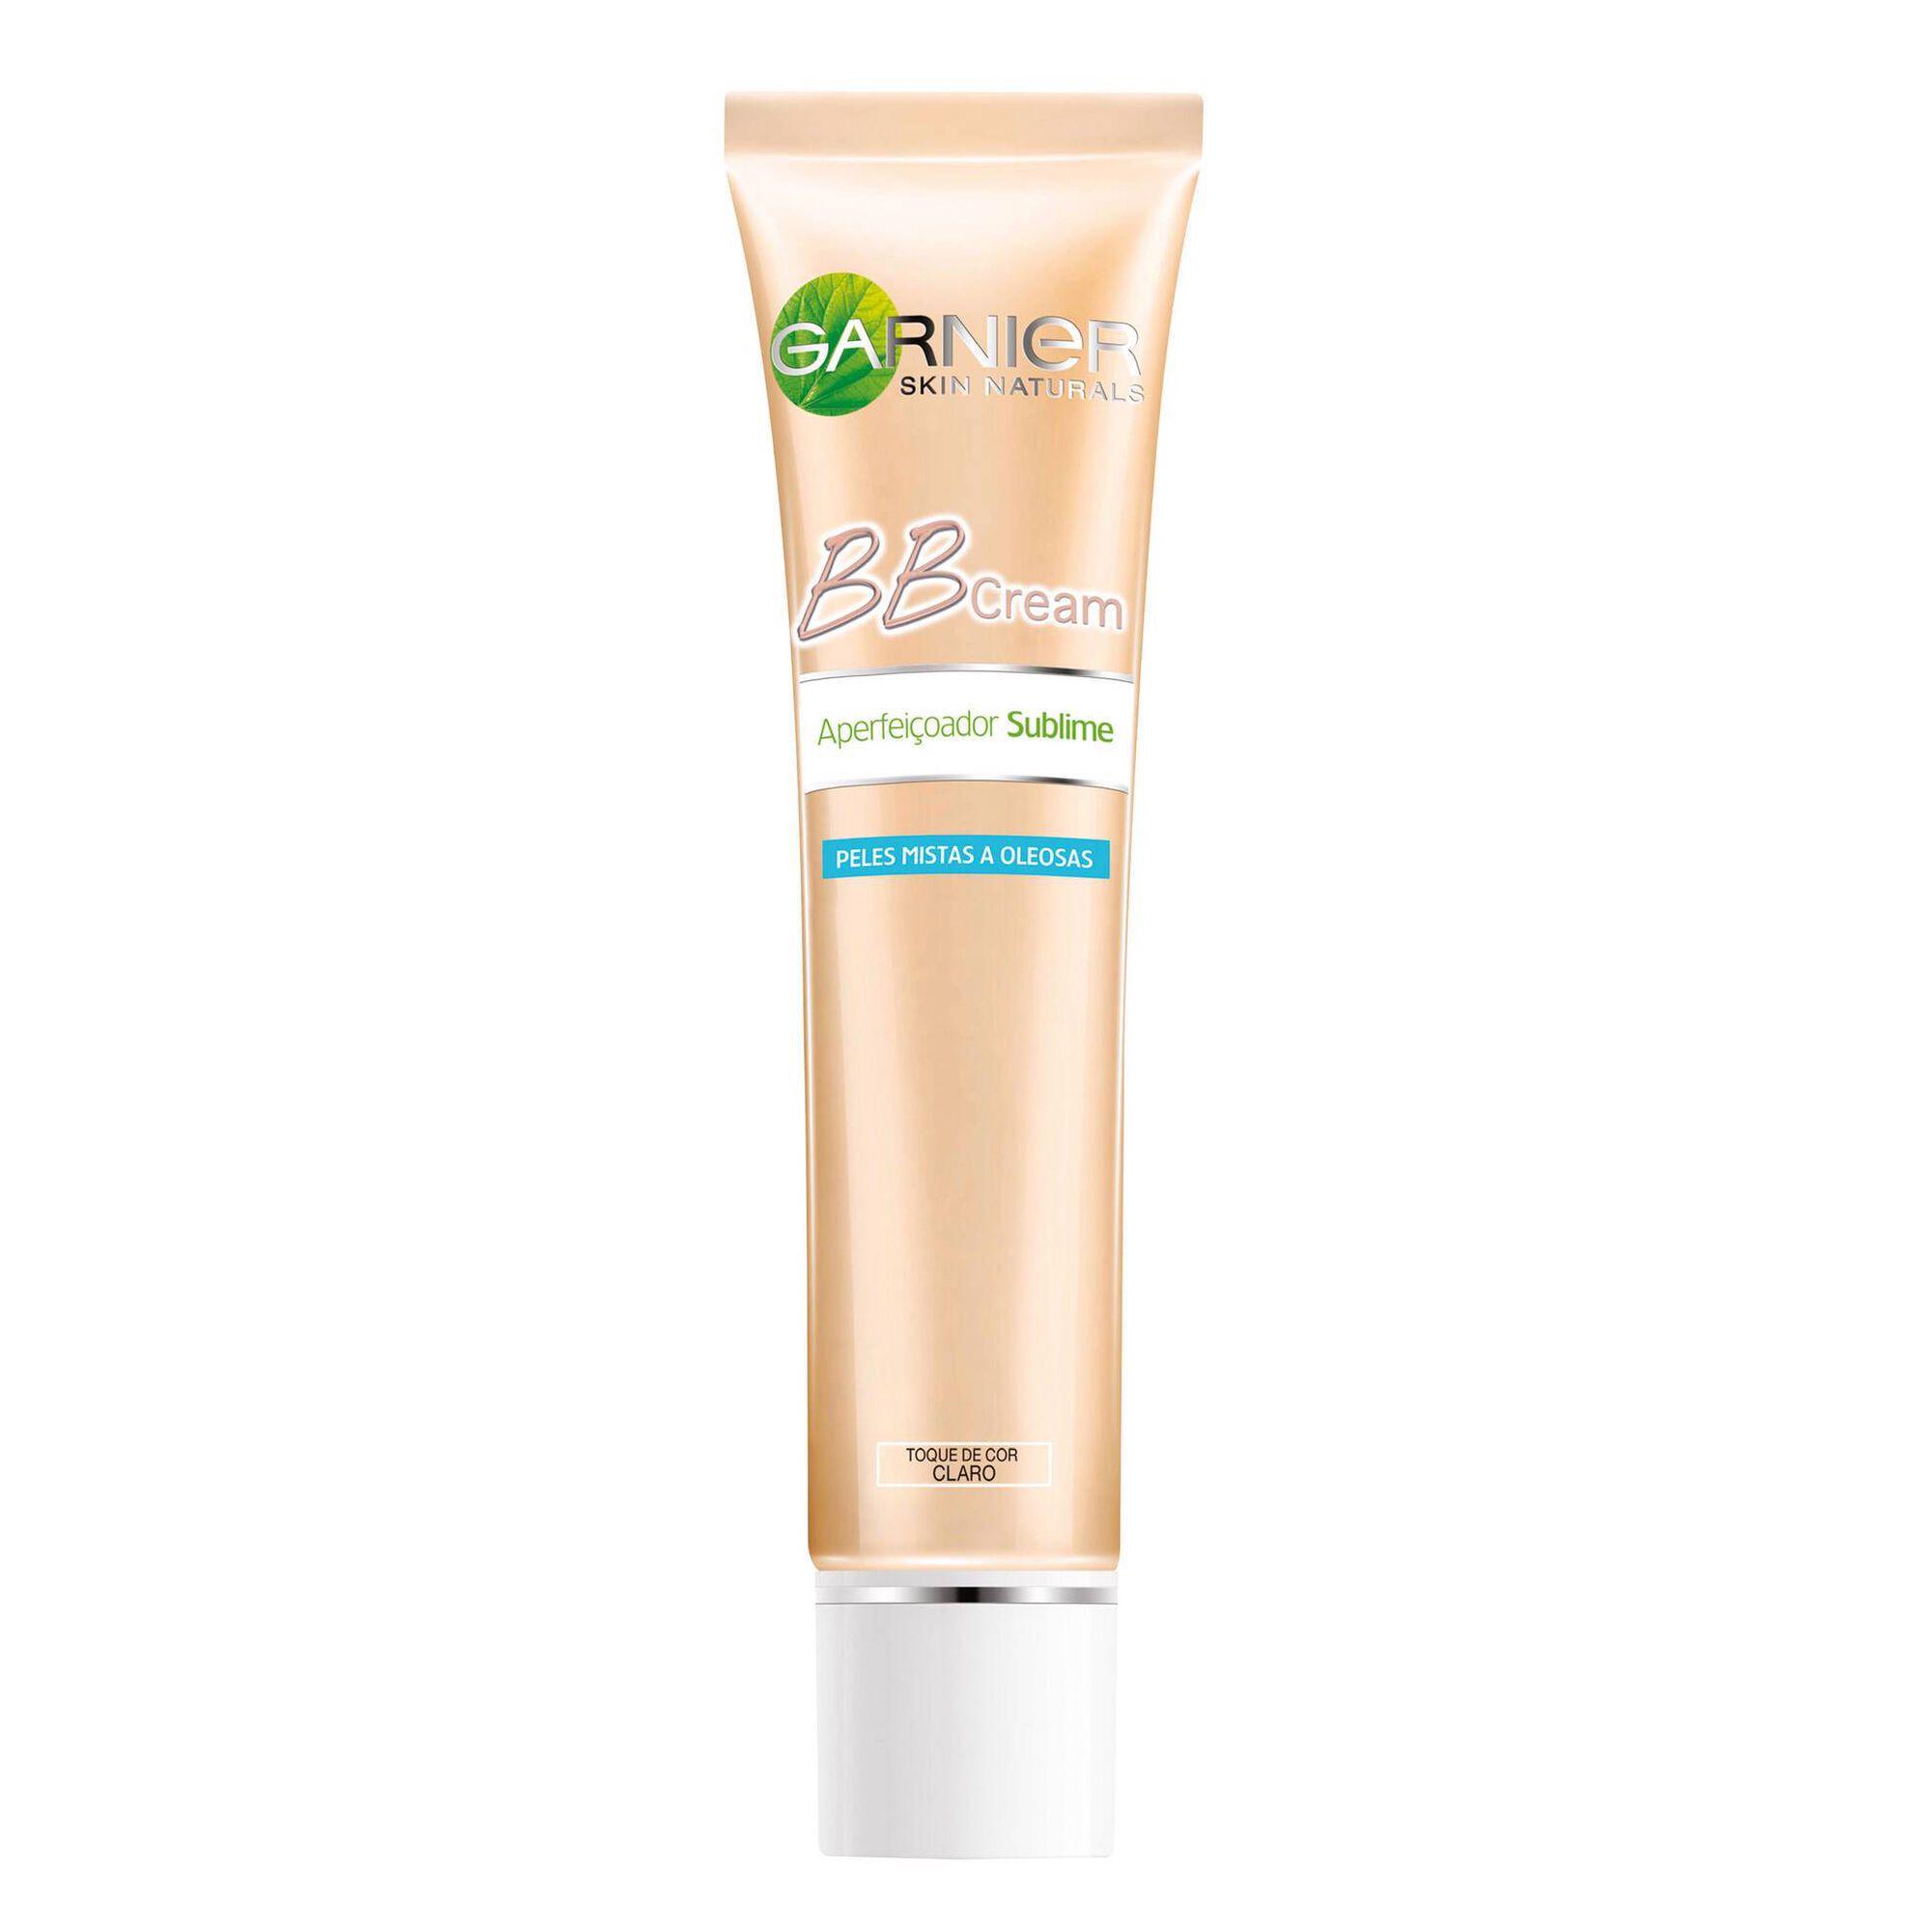 BB Cream Aperfeiçoador Sublime Claro Pele Mista e Oleosa